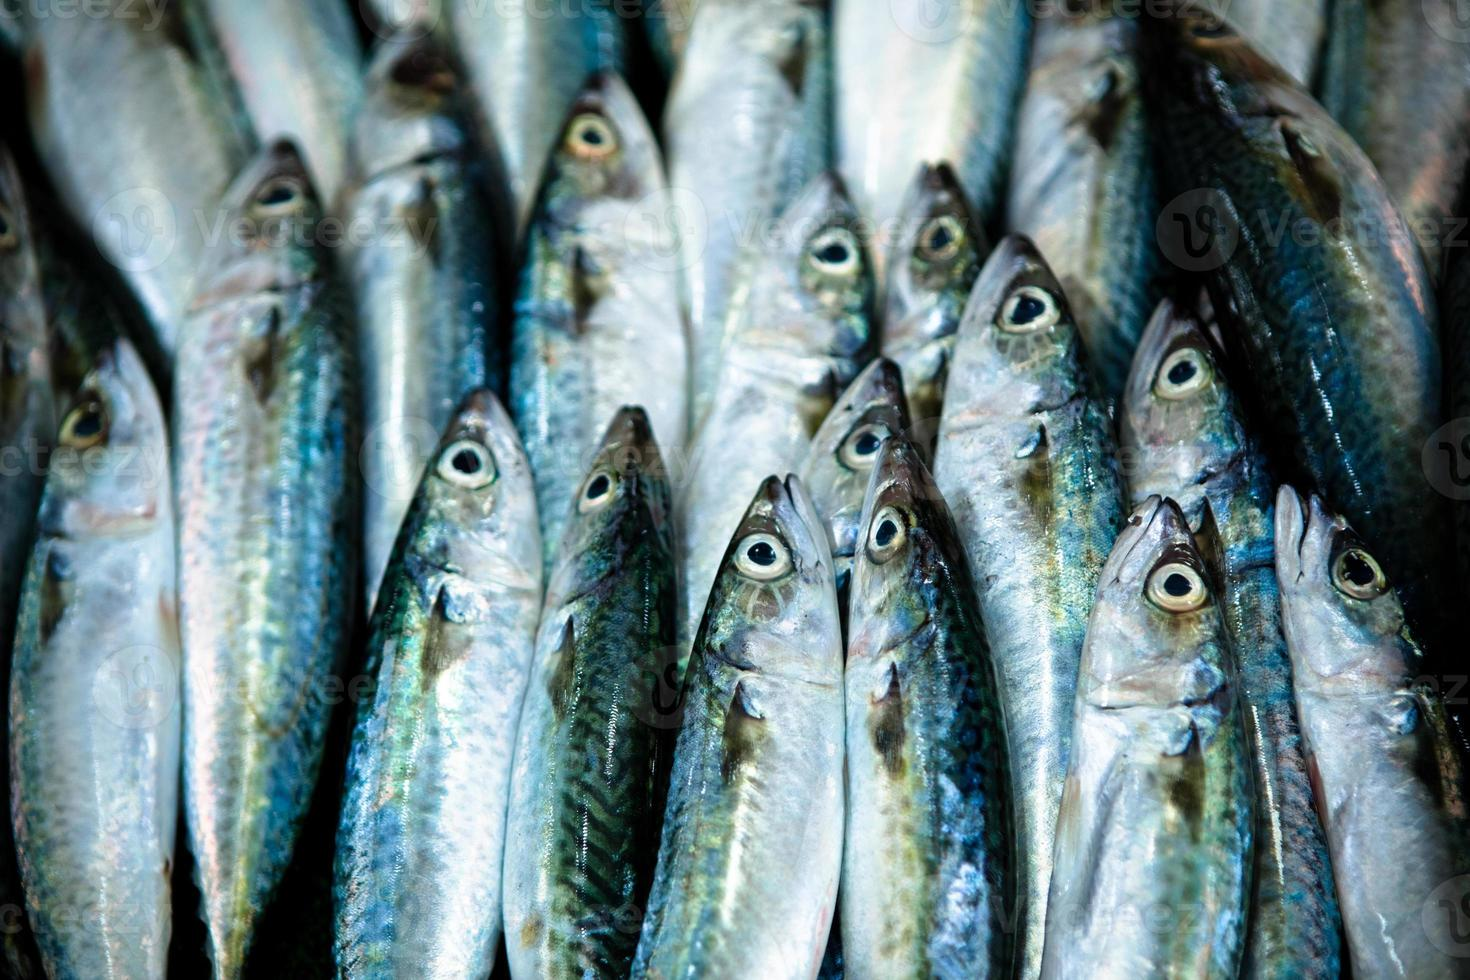 pilha de peixe à venda no mercado foto